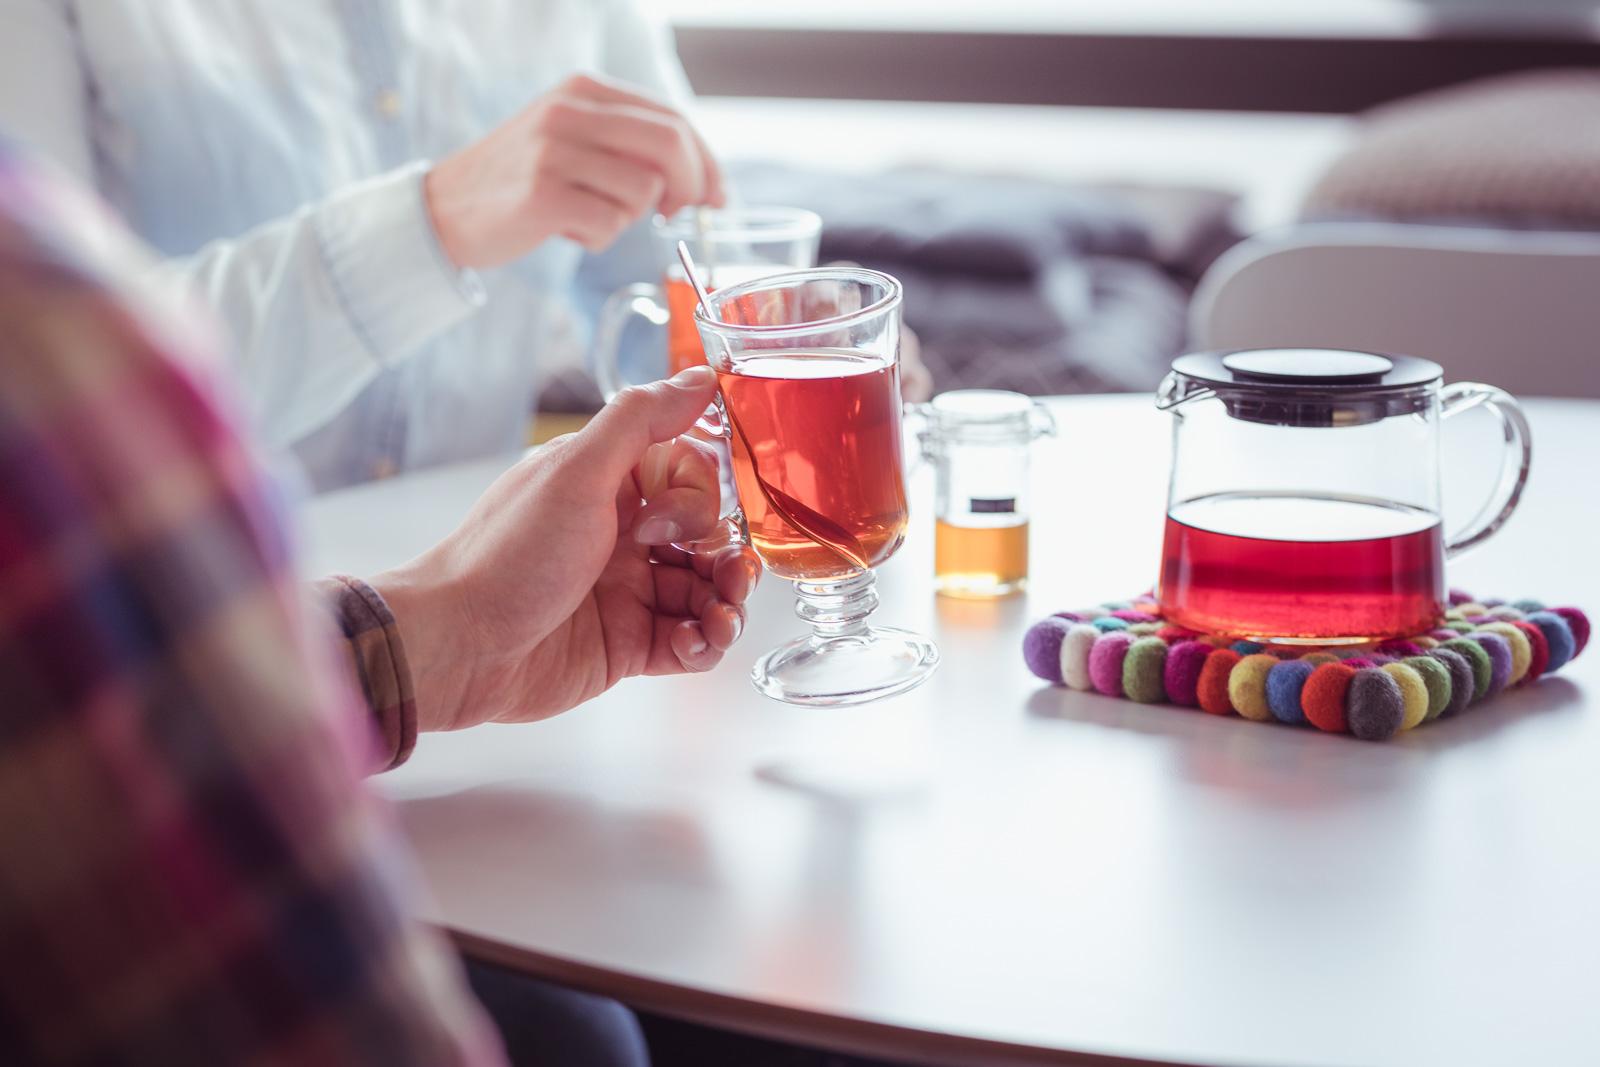 Tea in Hostel Cafe Koti in Rovaniemi Lapland Finland